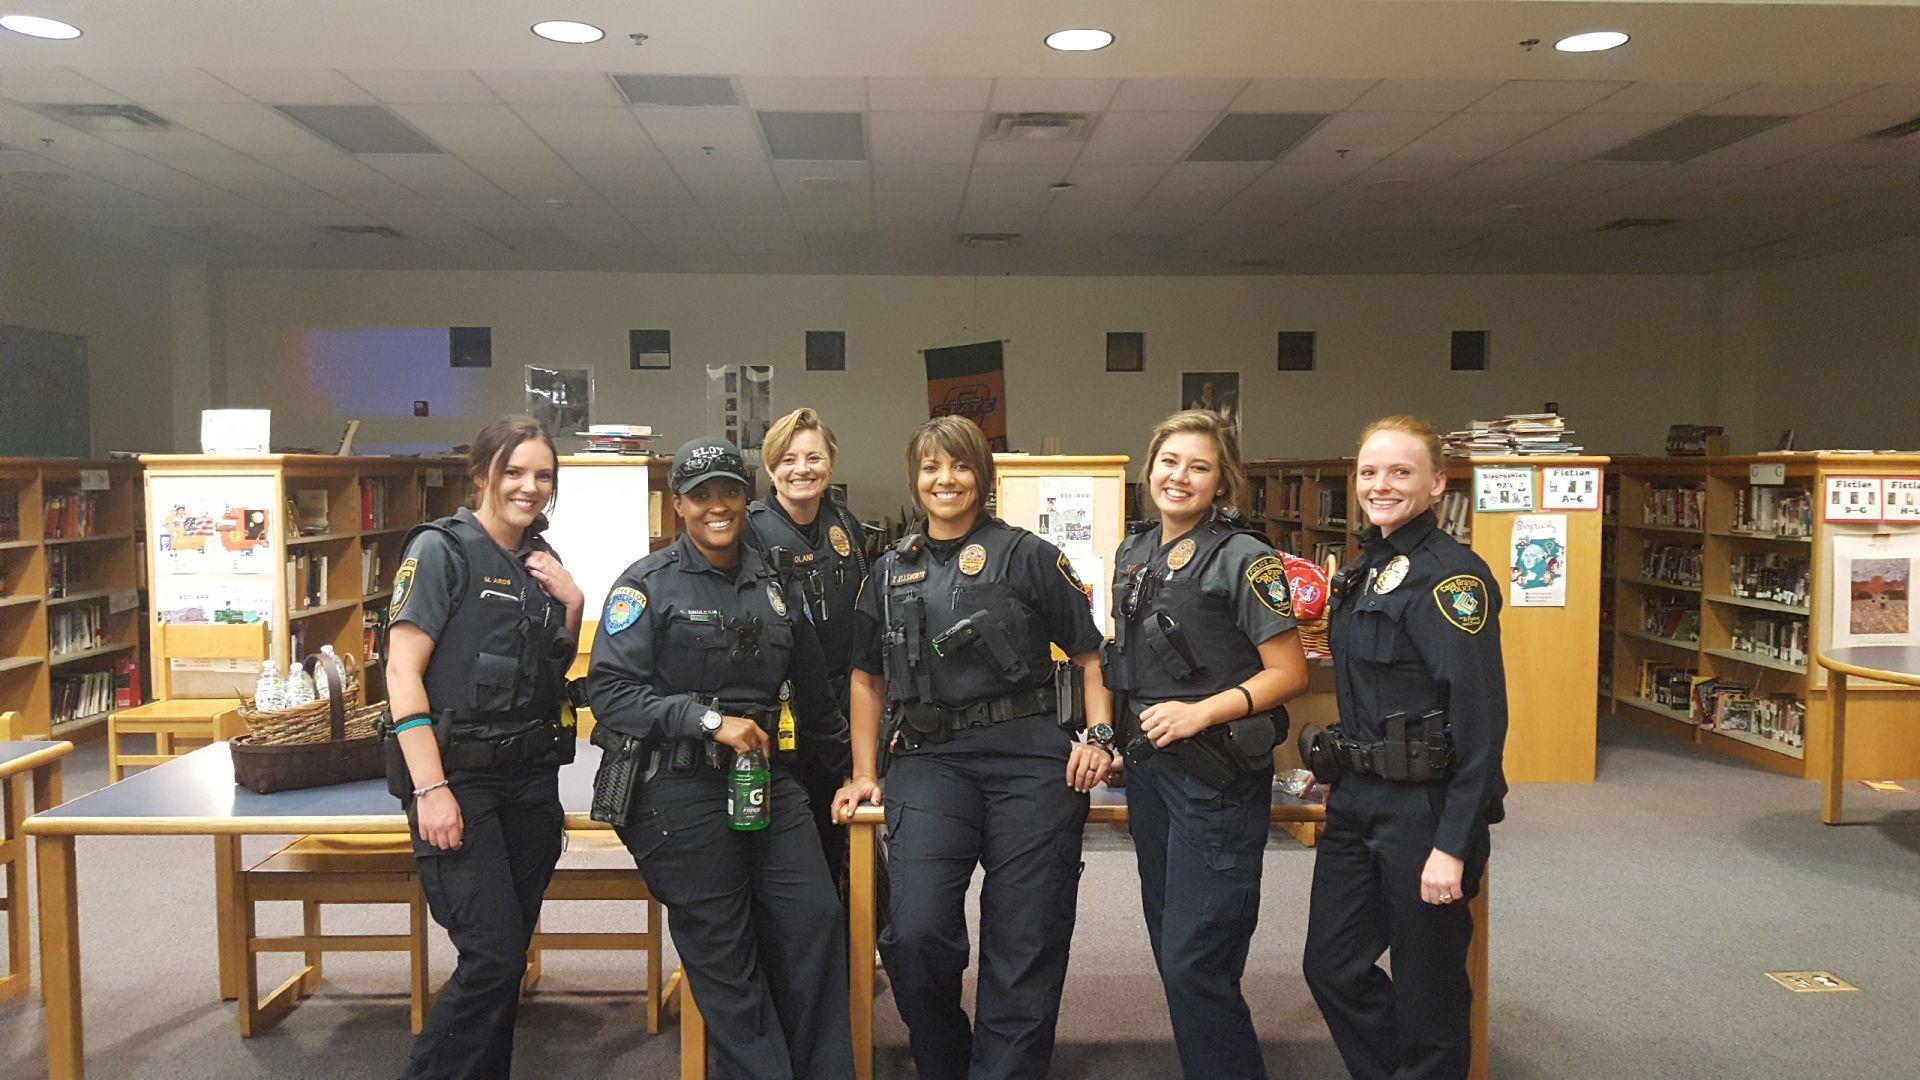 Female police picture 63